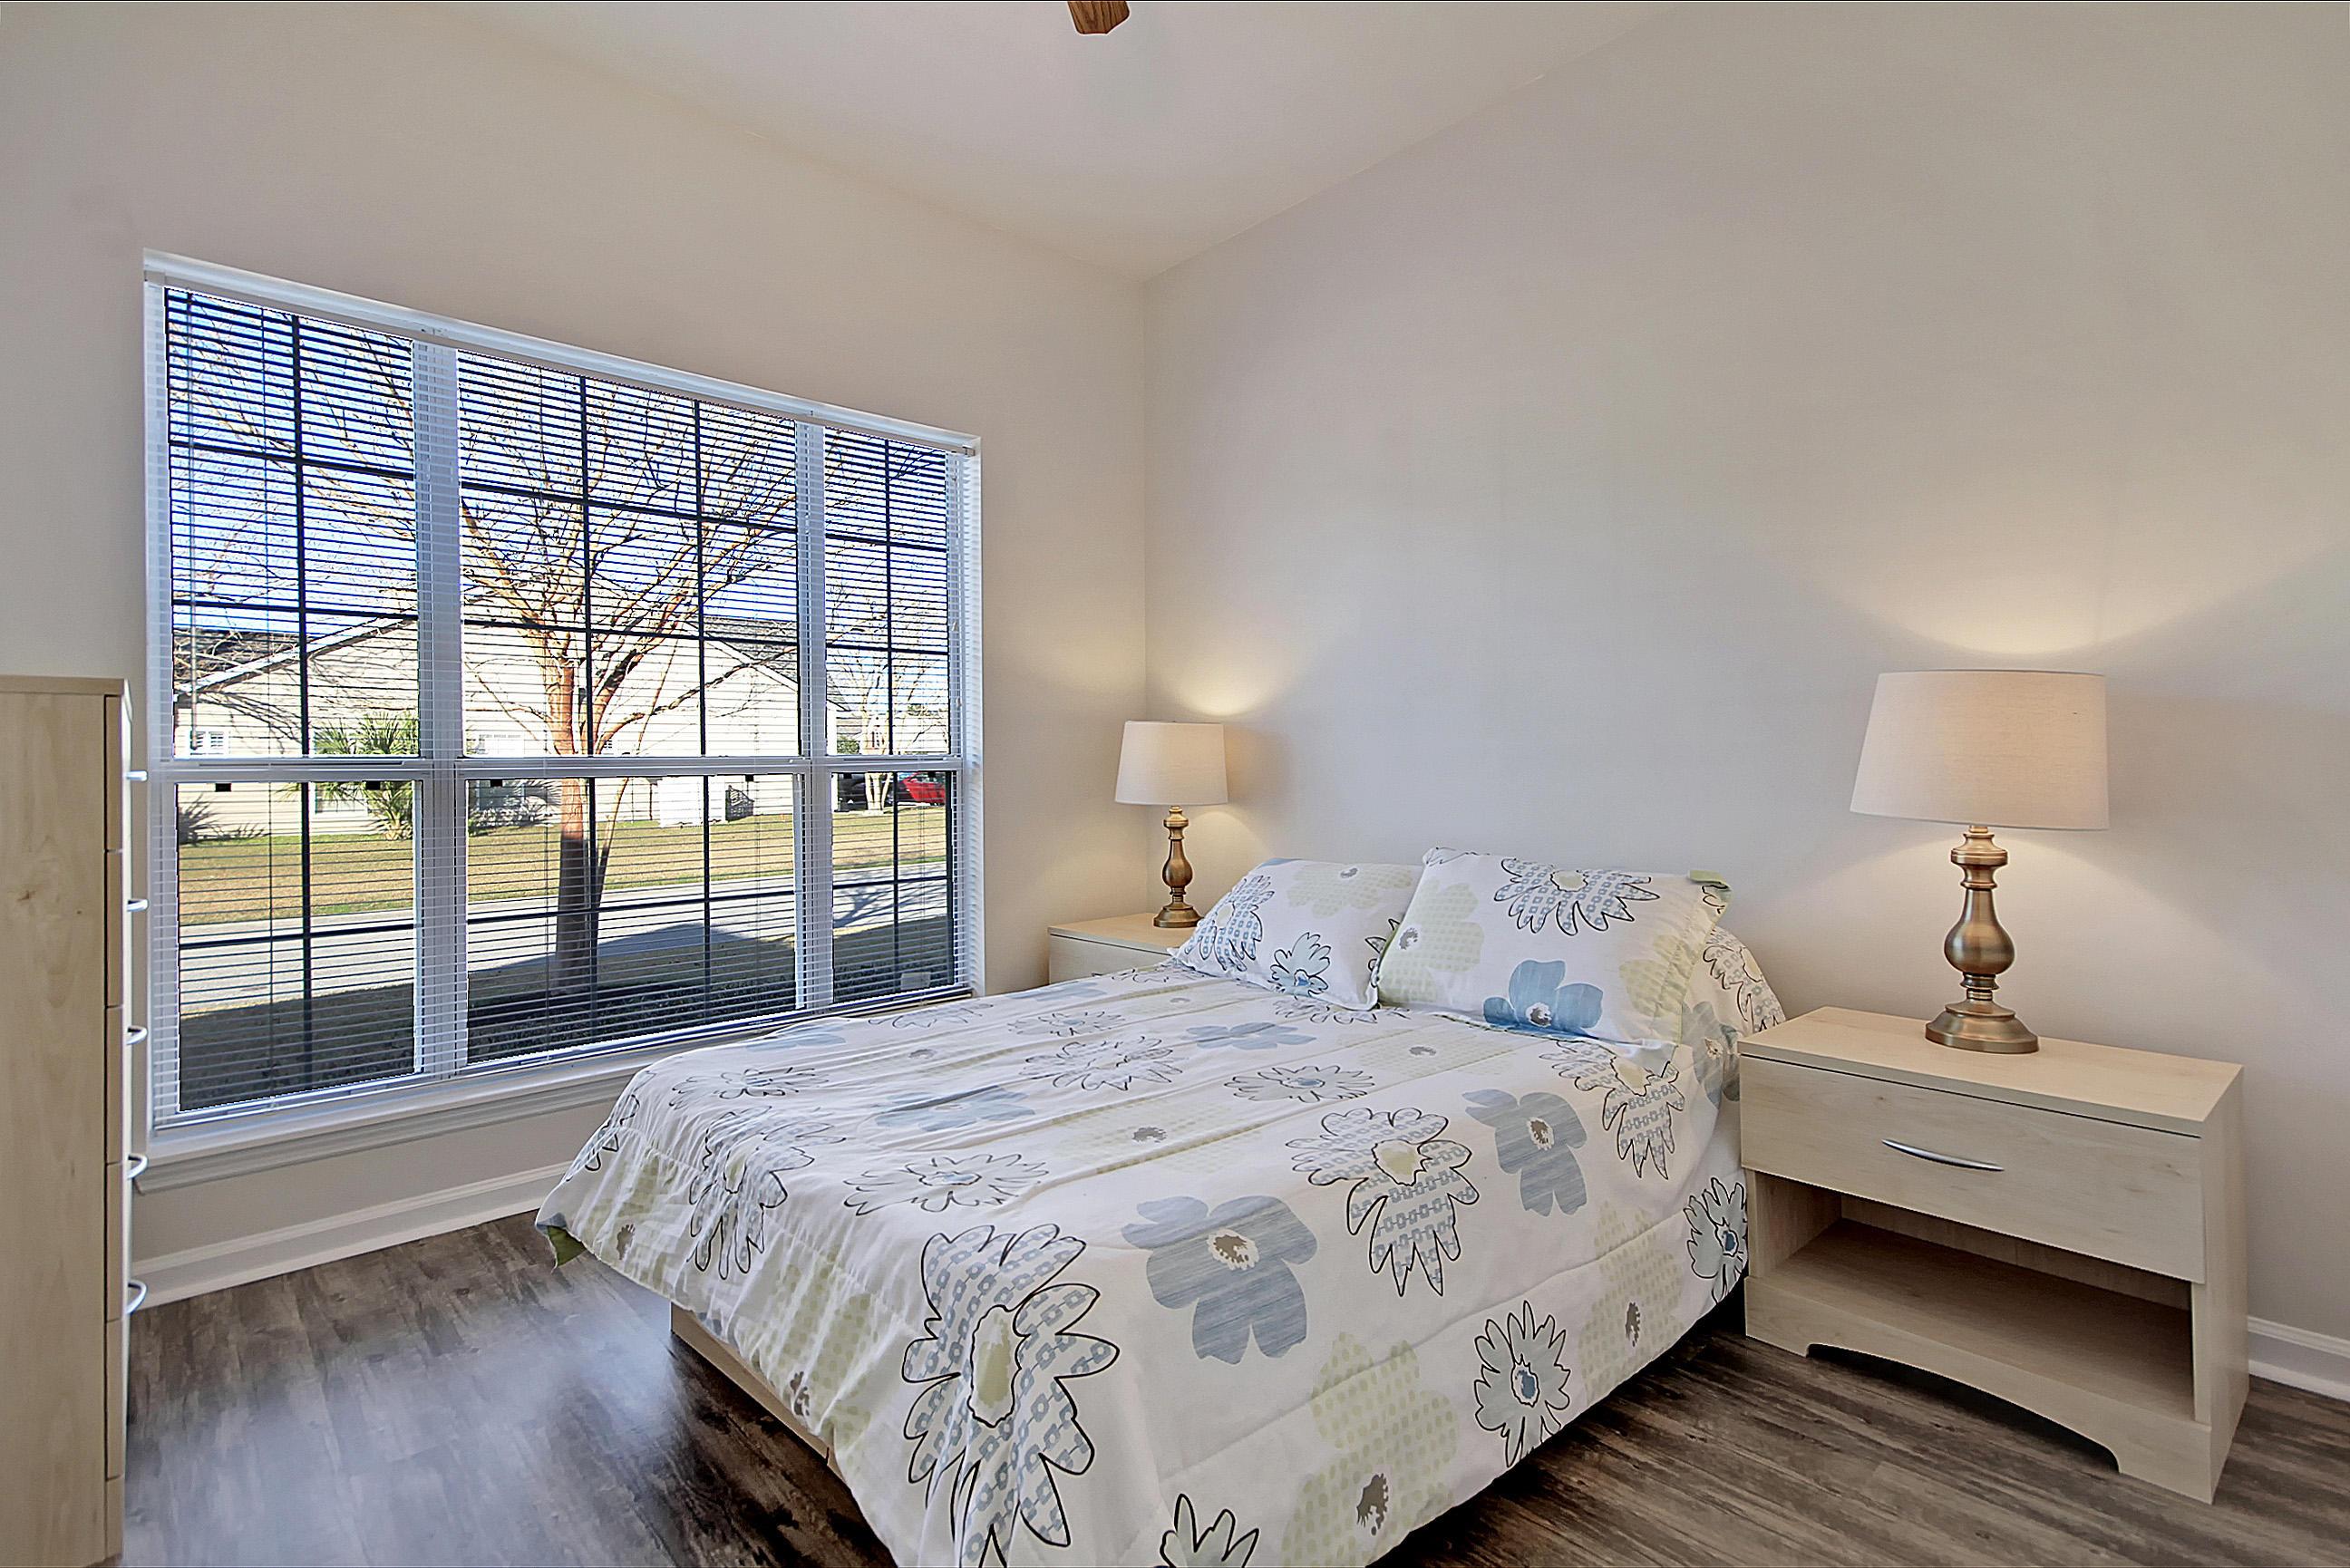 Dunes West Homes For Sale - 2656 Palmetto Hall, Mount Pleasant, SC - 14